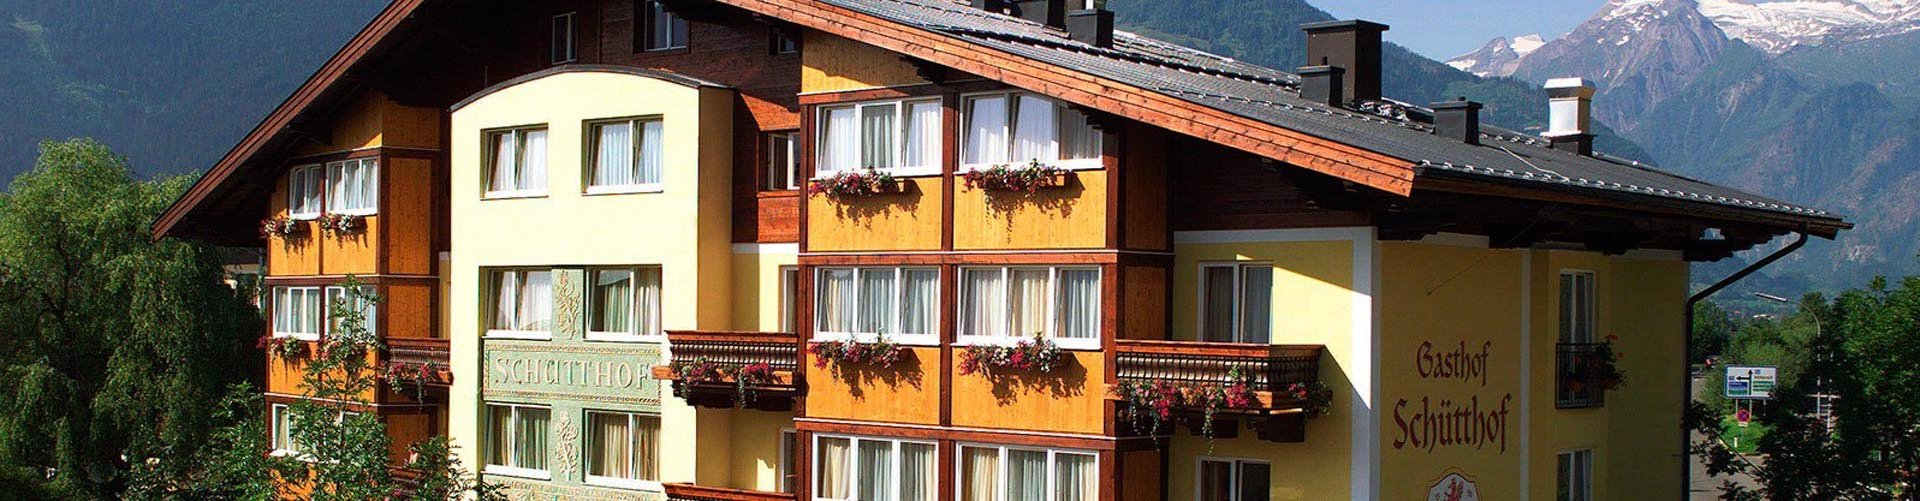 Hotel Schütthof in Zell am See